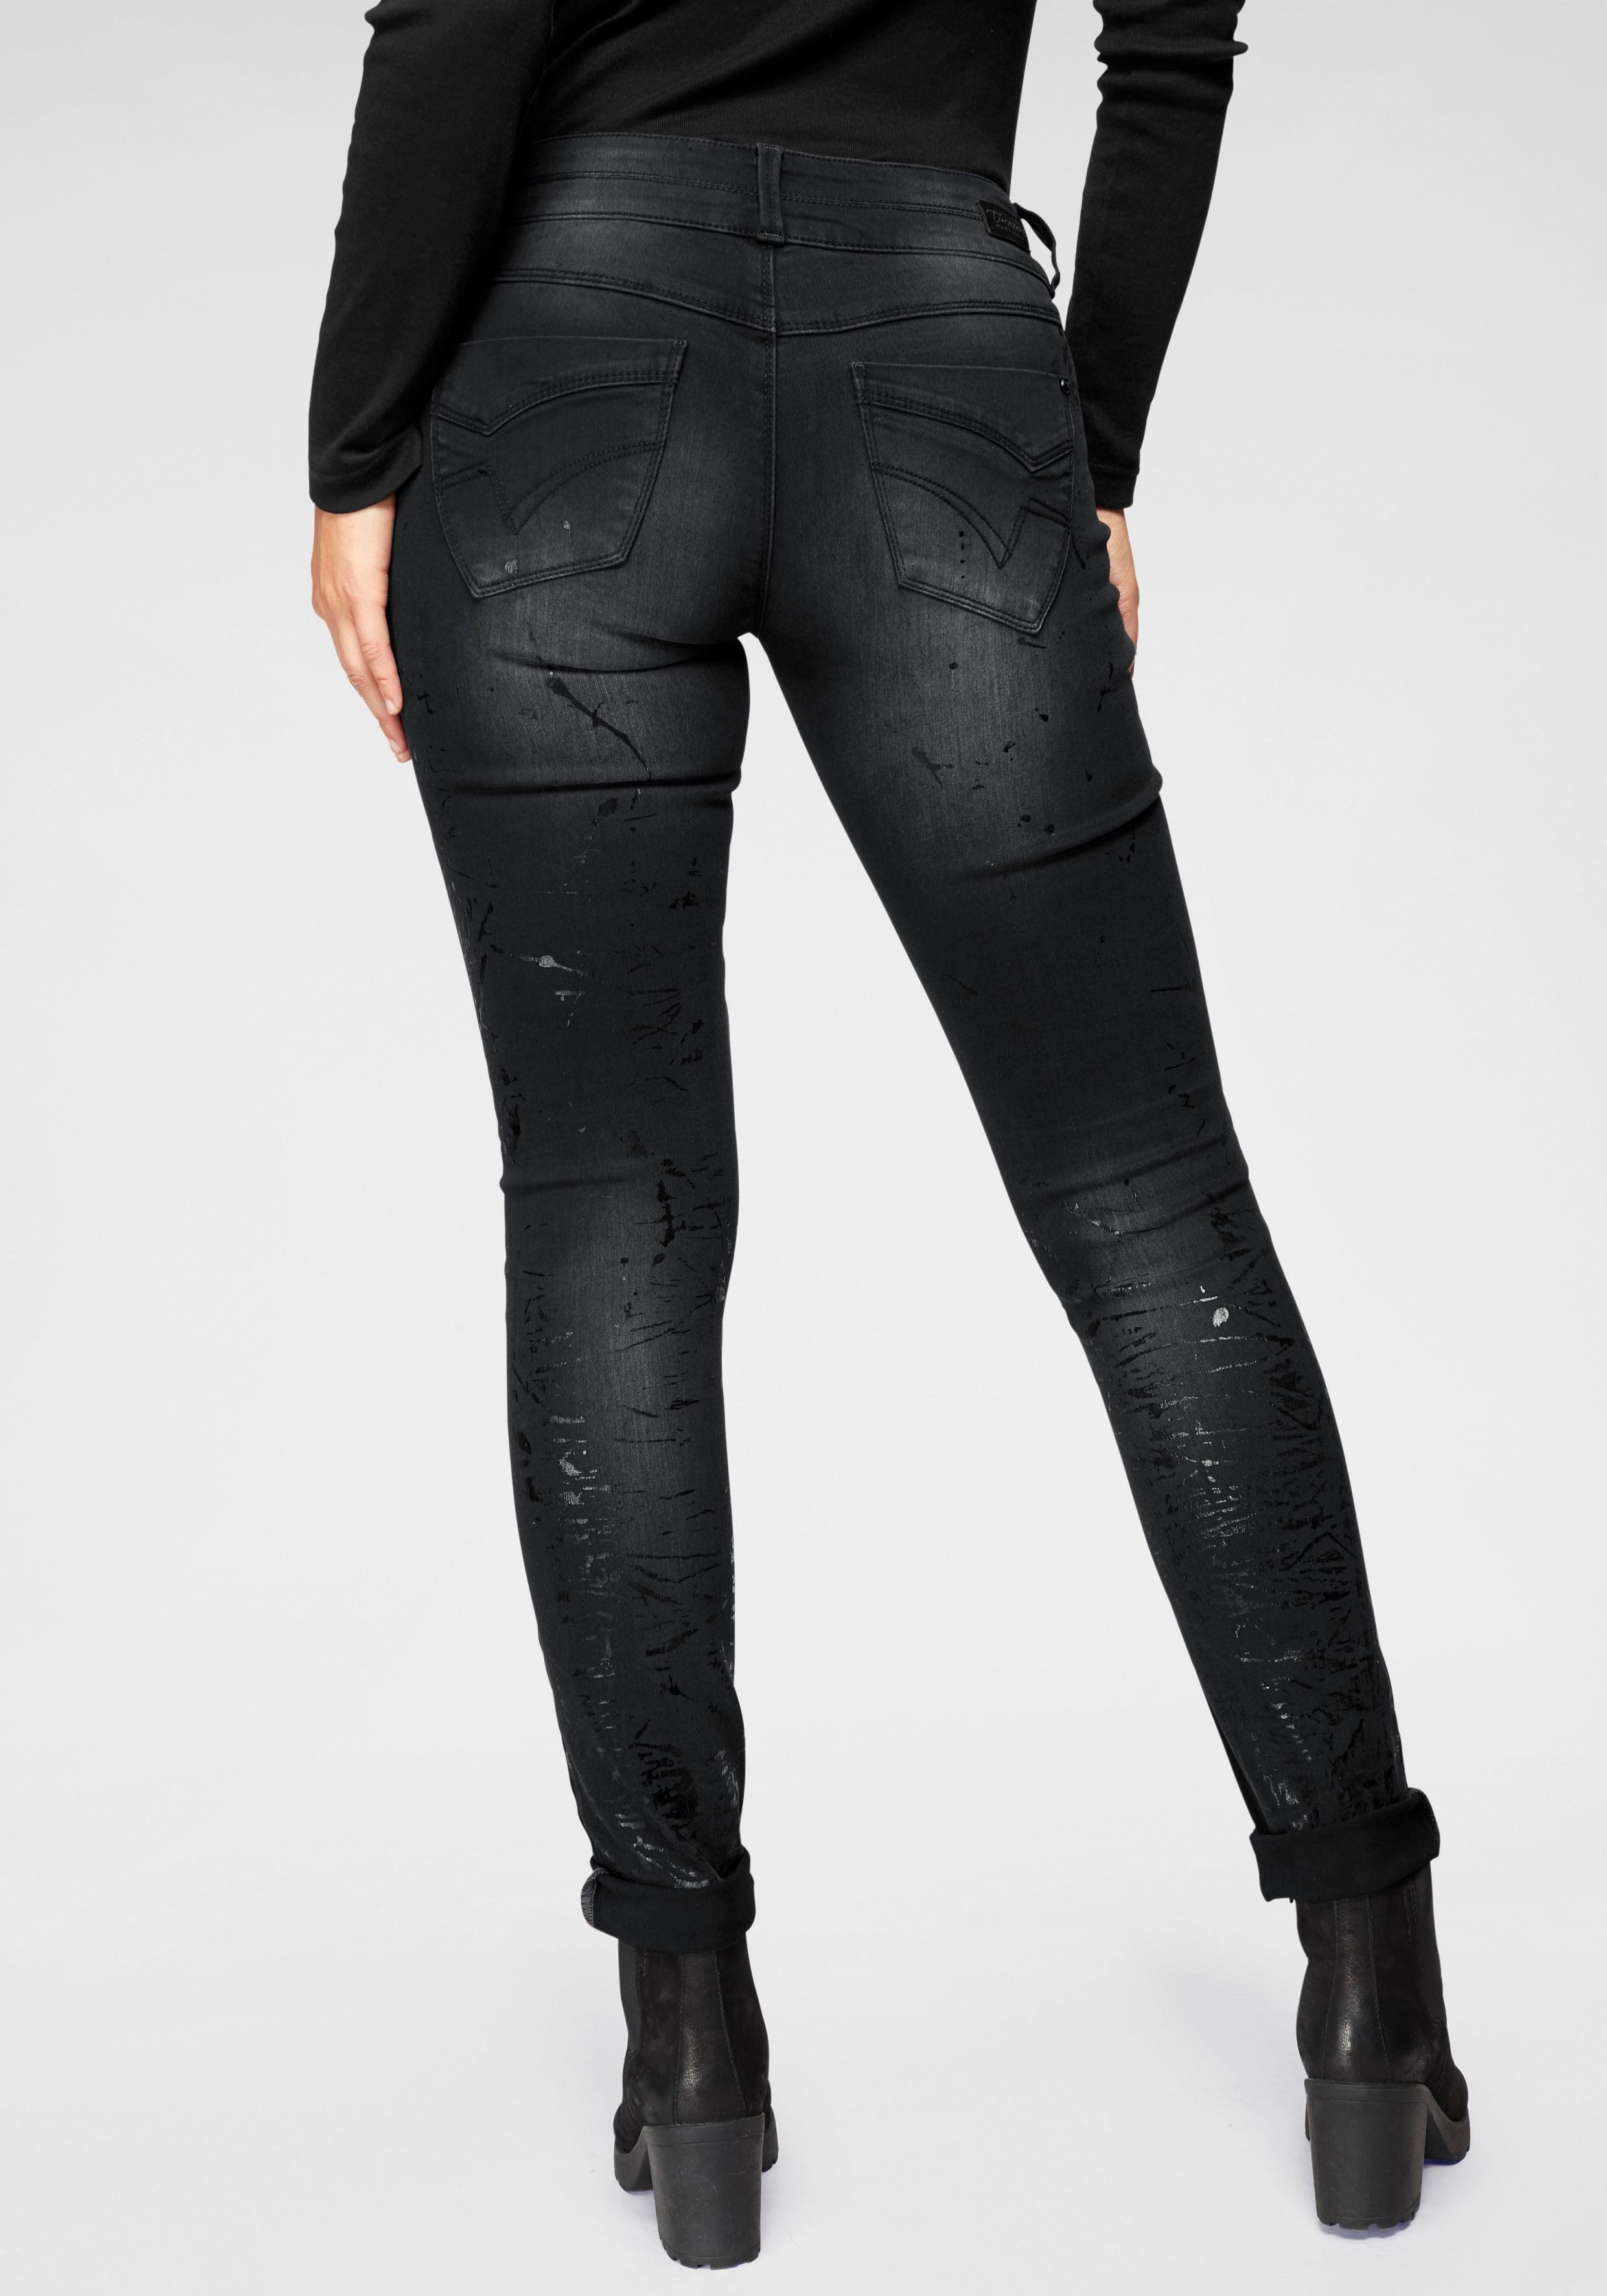 Timezone Jeans ENYA Elastische Slim Fit Jeans im Used Look